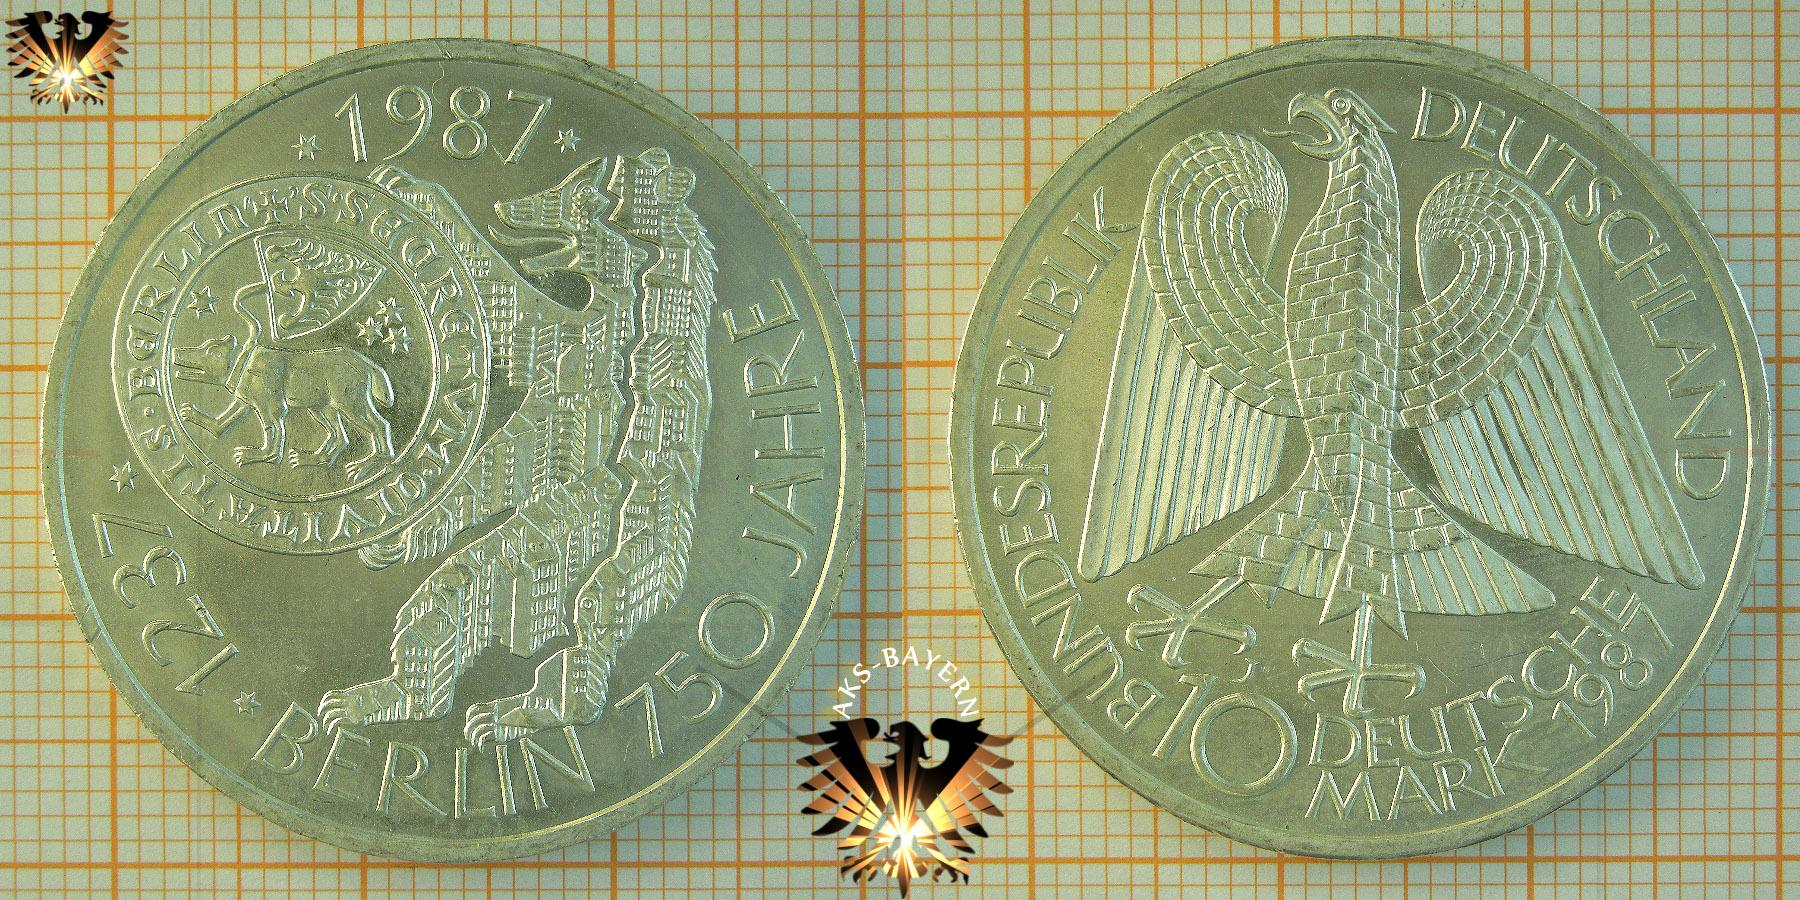 10 Dm Brd 1987 J Berlin 750 Jahre 1237 1987 Silber Gedenkmünze